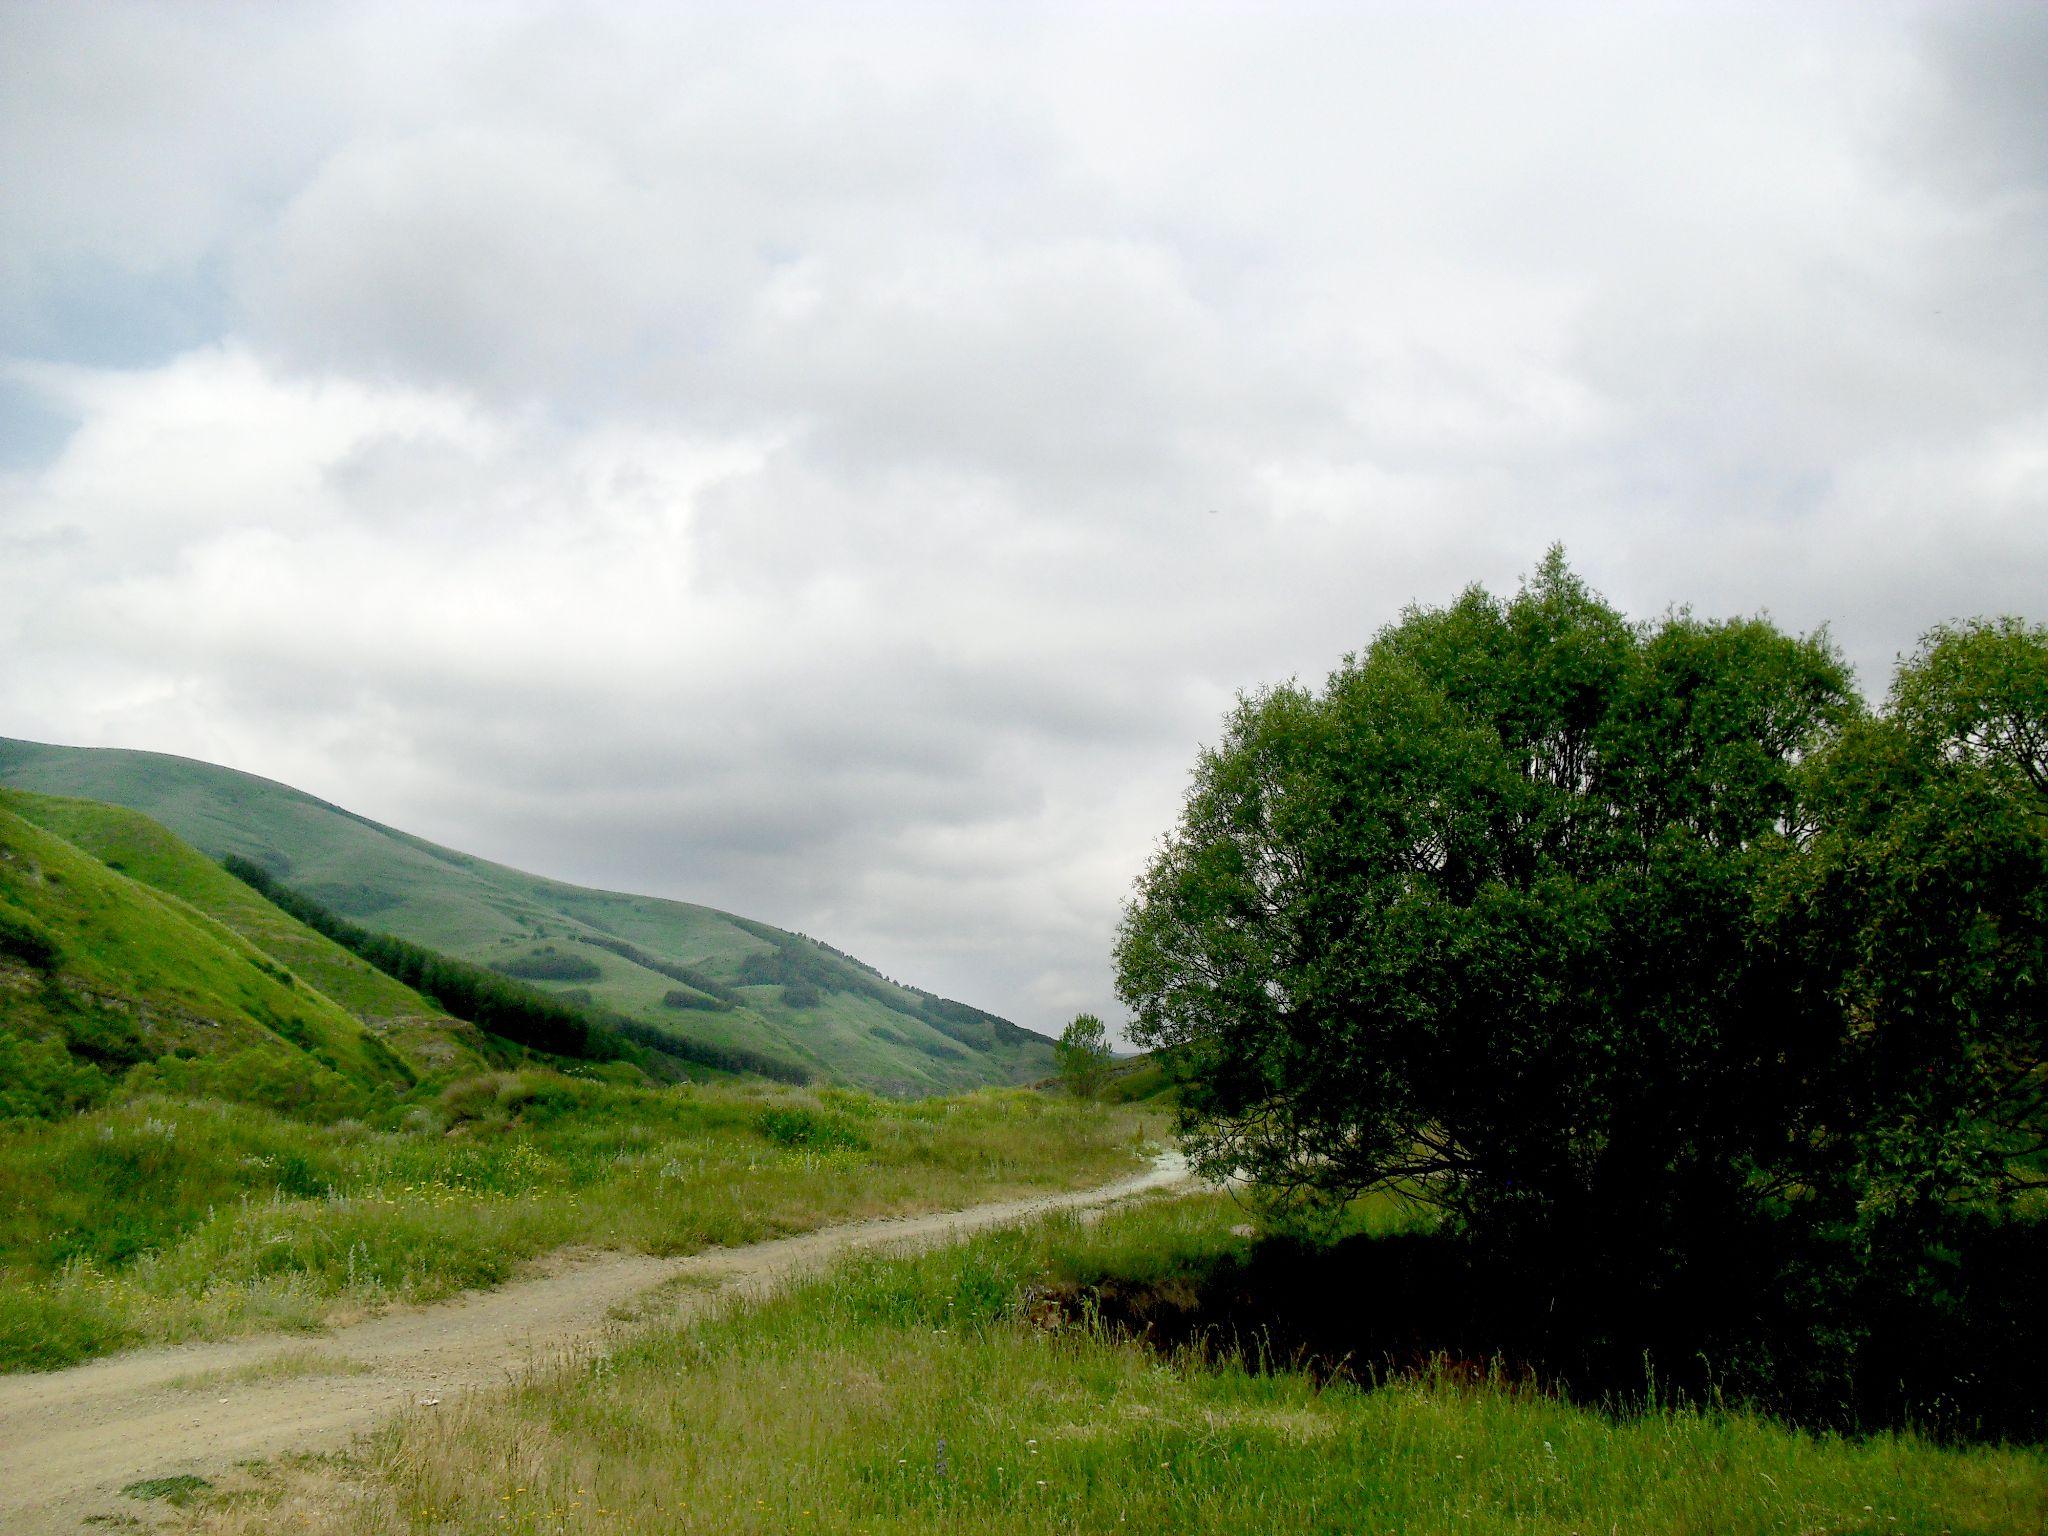 Road by Mher Karapetyan